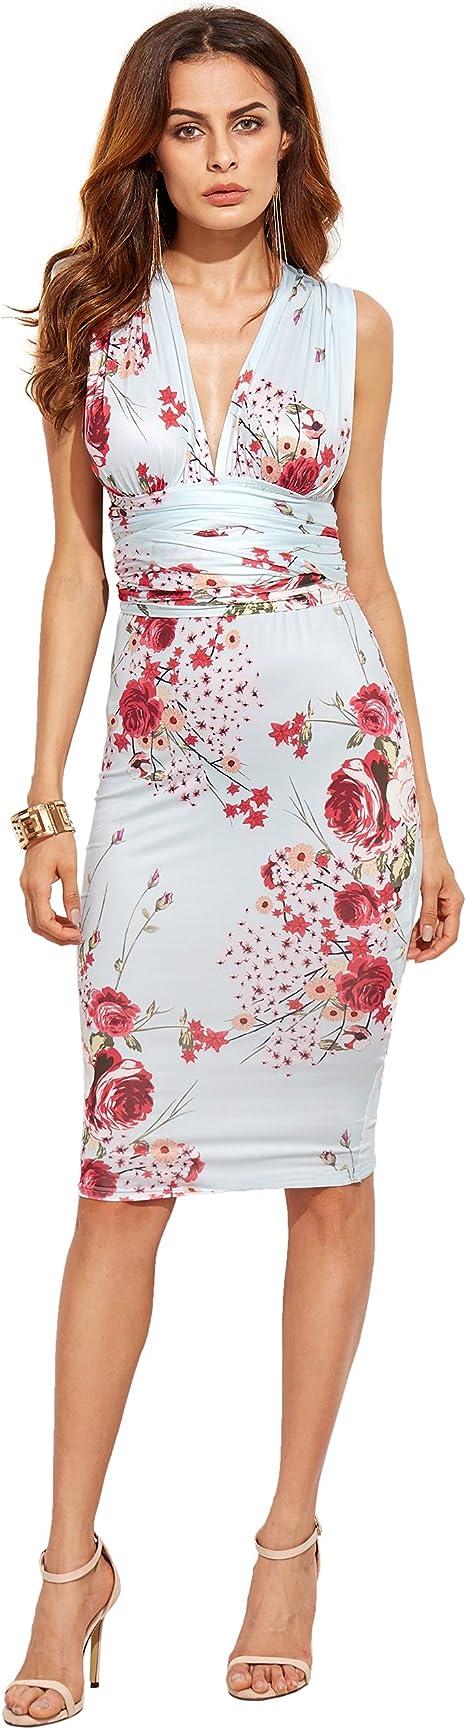 SheIn Damen Etui Kleid Gr. S, mehrfarbig  Amazon.de Bekleidung